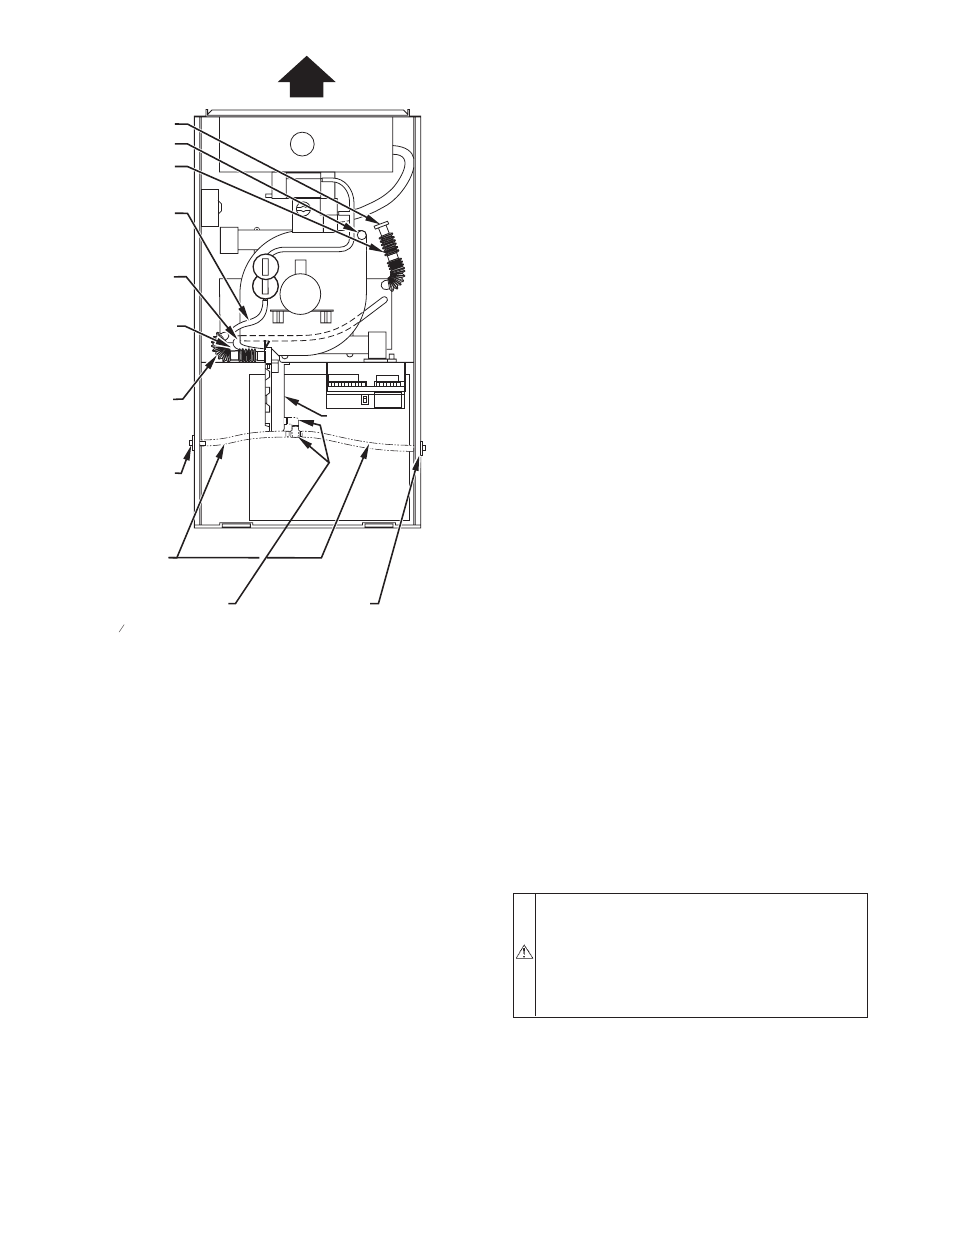 Bryant 355mav User Manual Page 4 20 Blower Motor Wiring